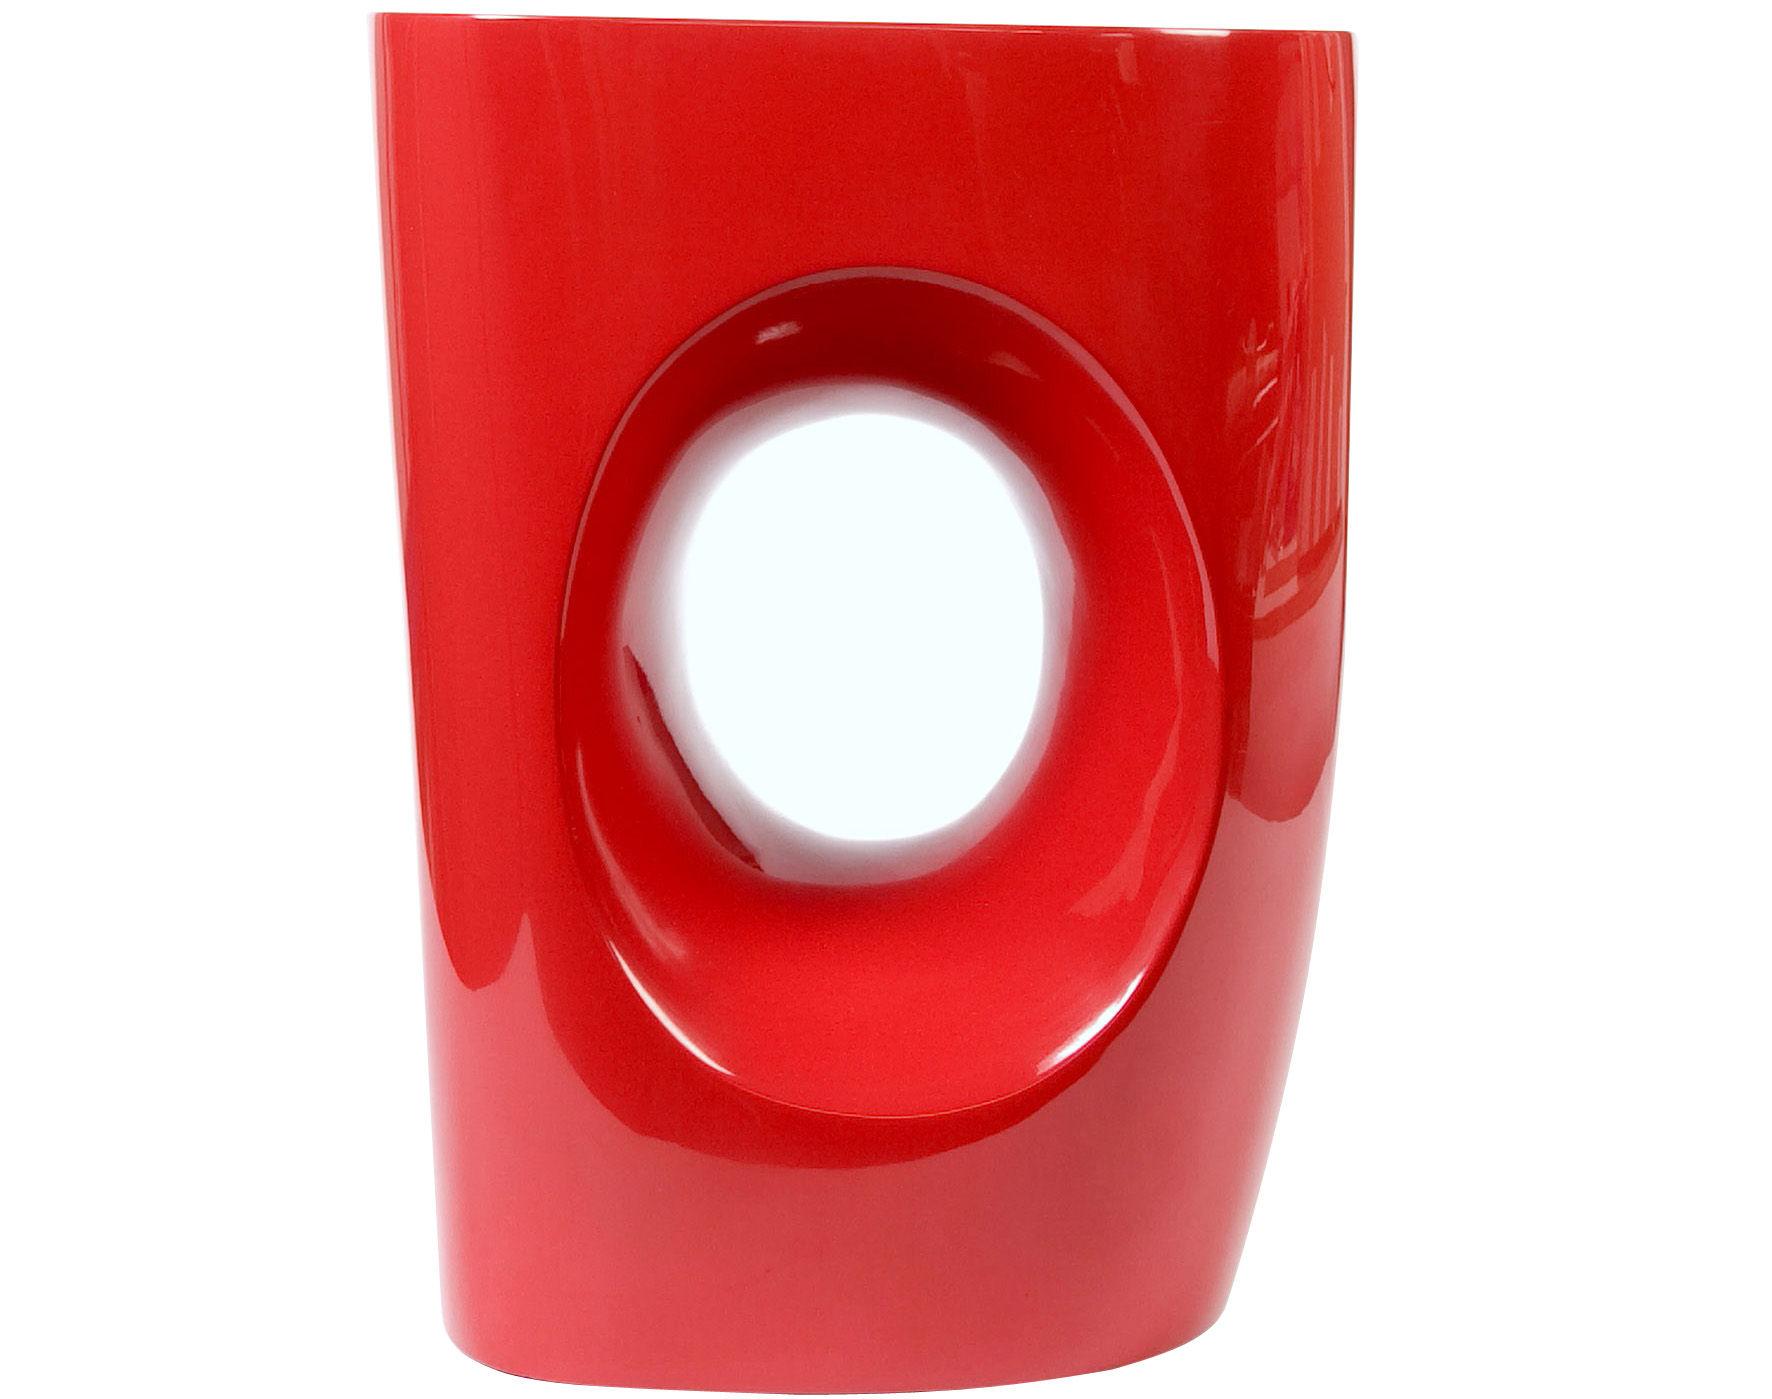 devils eye hocker beistelltisch exklusiv pols potten niedriger hocker. Black Bedroom Furniture Sets. Home Design Ideas